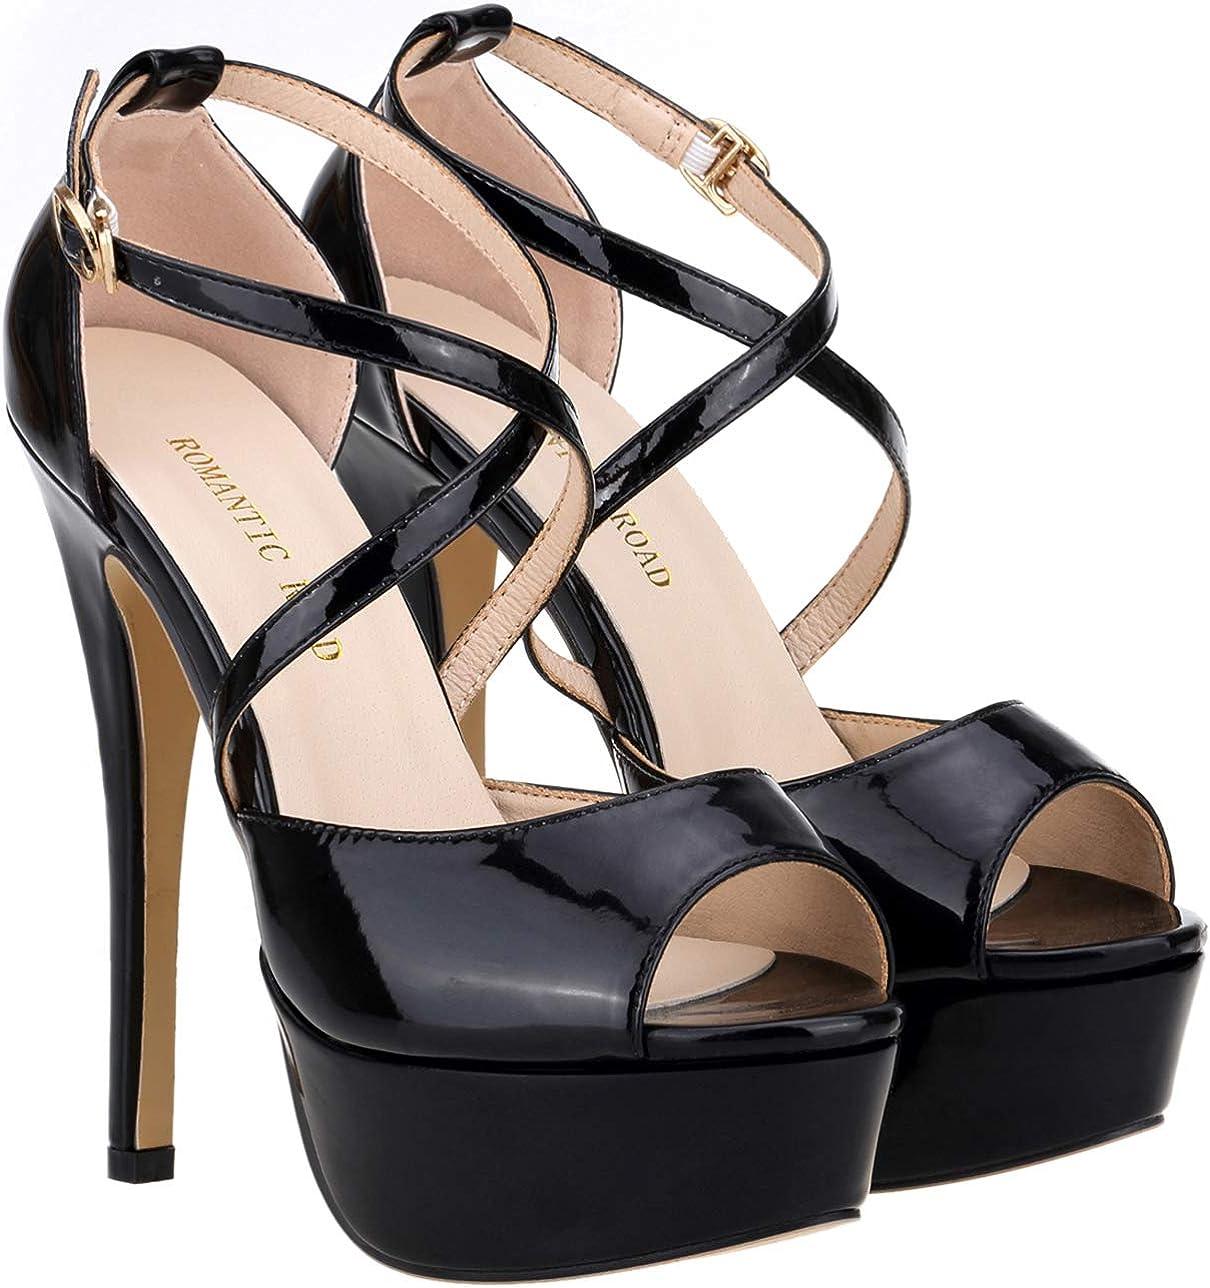 Amazon Com Romantic Road Heels For Women 5 5in High Heels For Women Stiletto Sandals Crisscross Strappy Peep Toe Platform Party Pumps Sandals